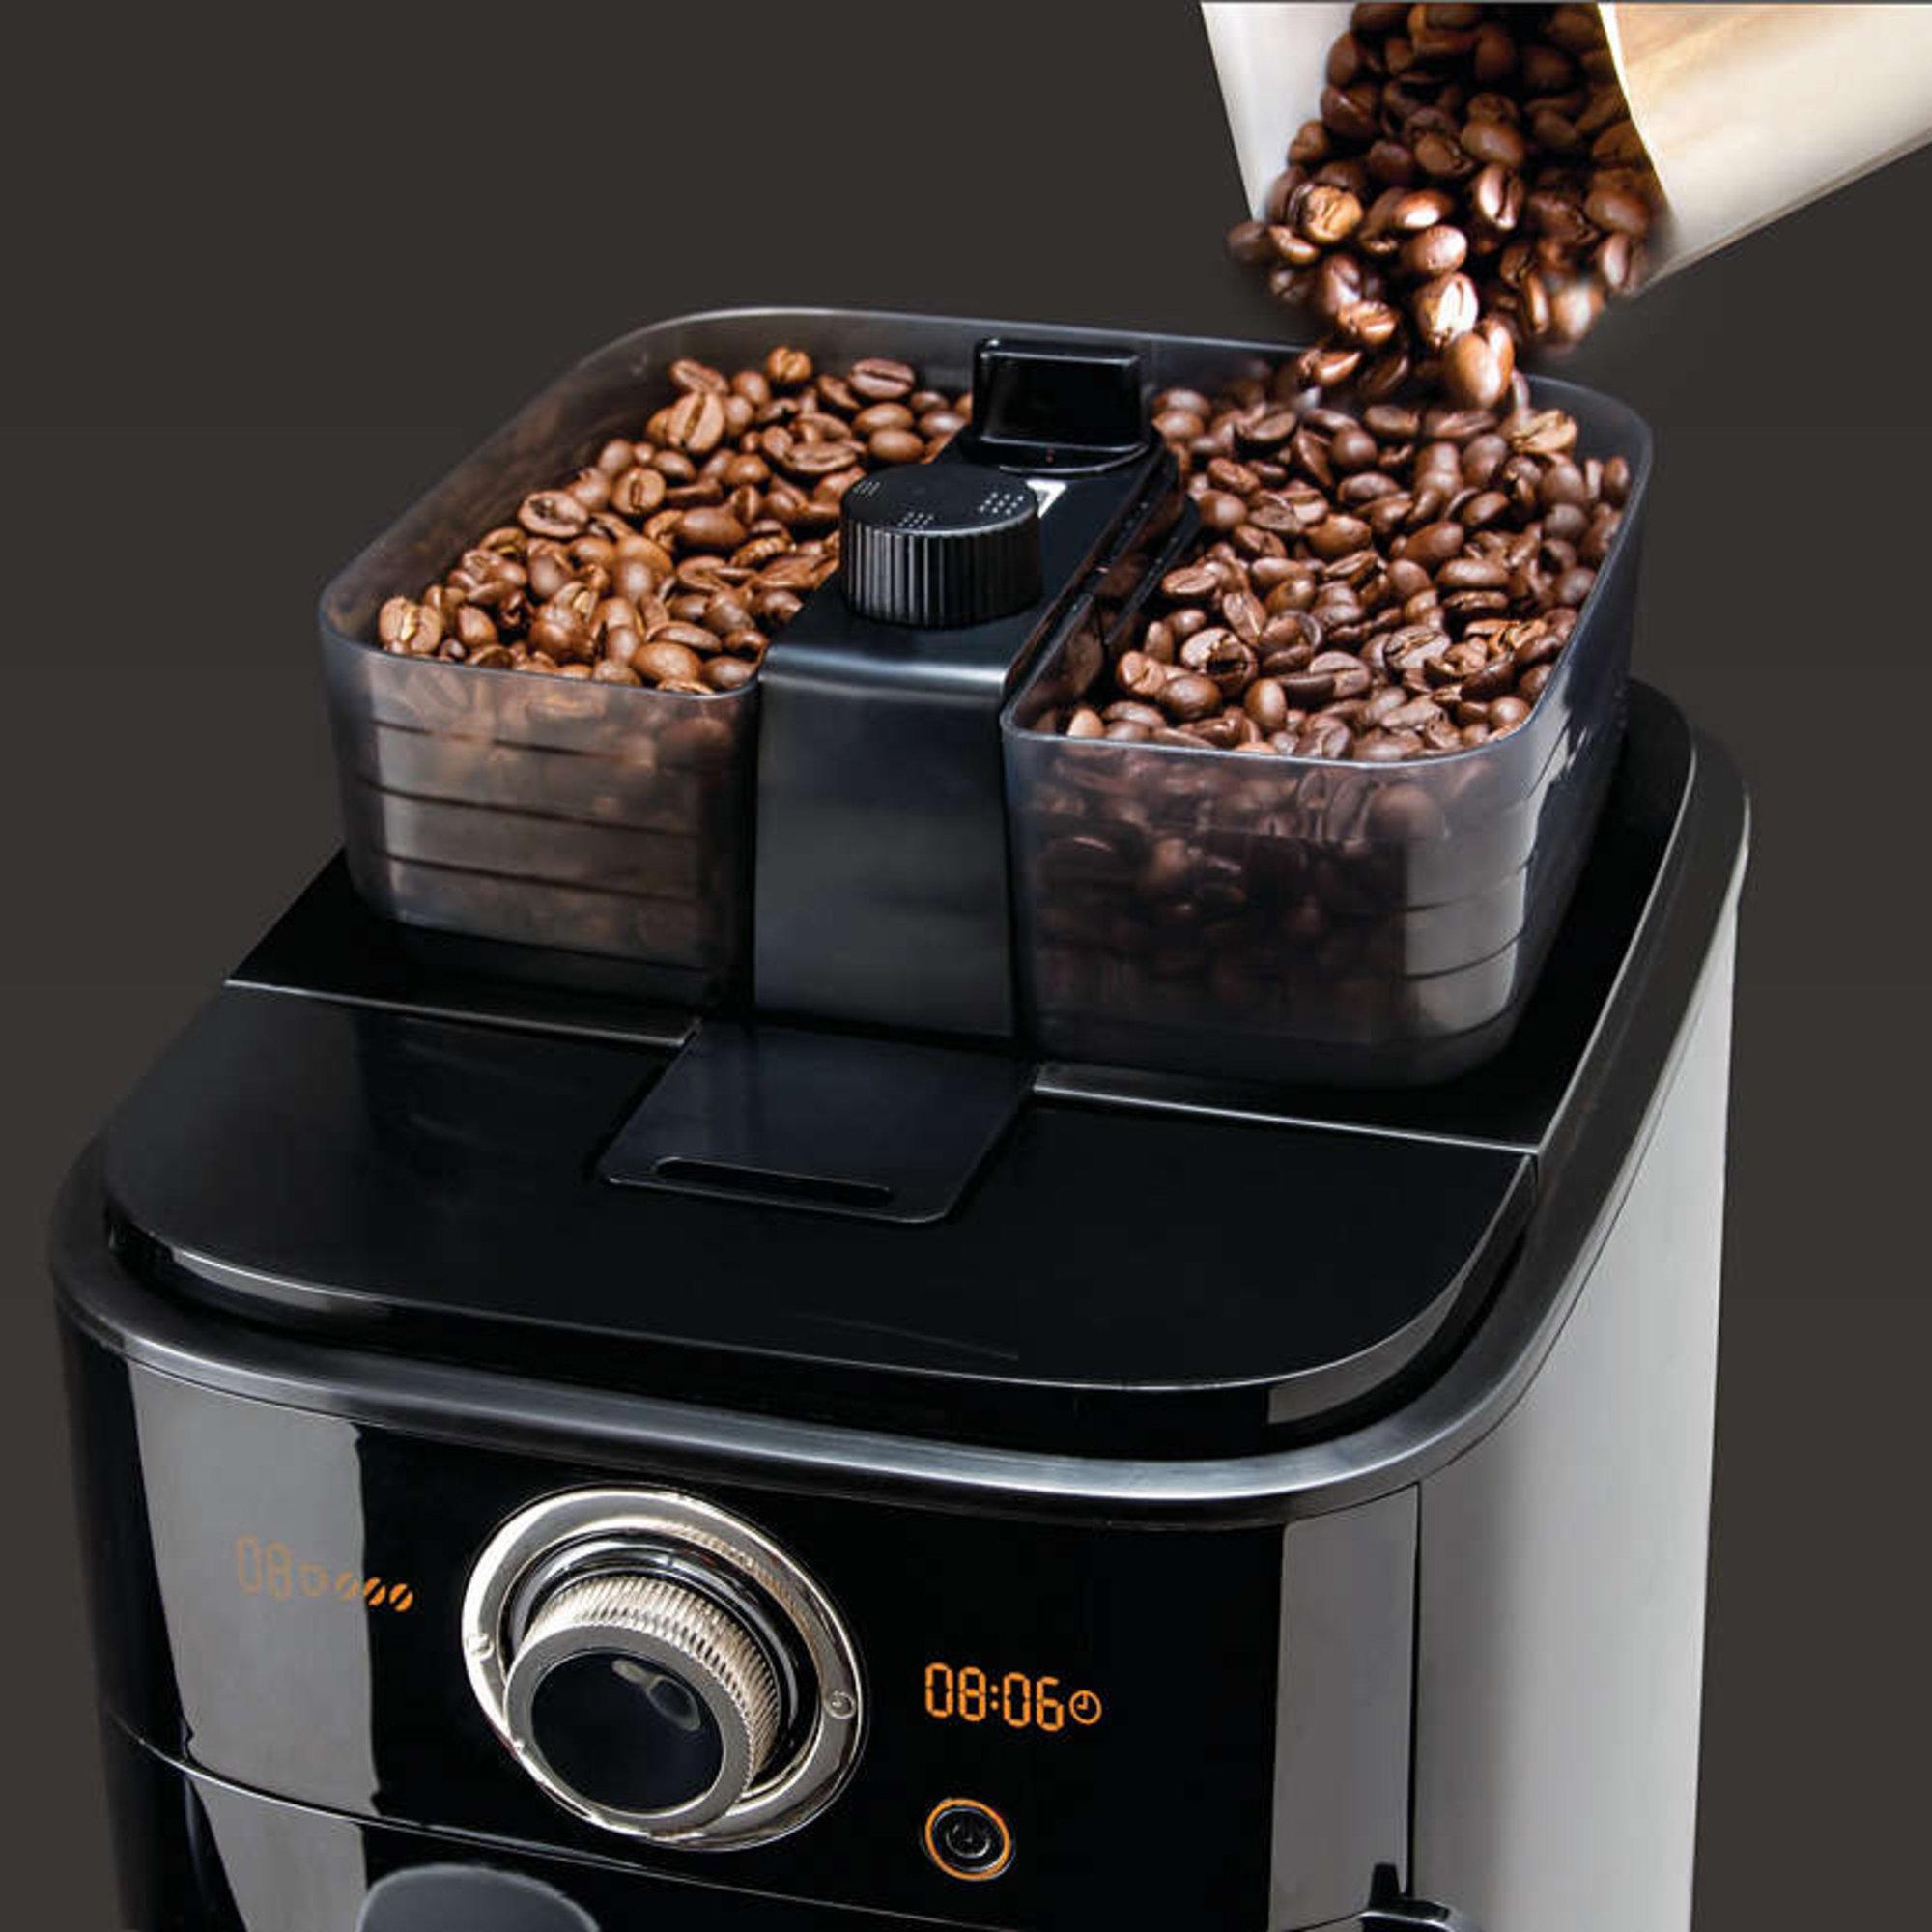 Bestil HD7766/00 Grind & Brew kaffemaskine fra Philips